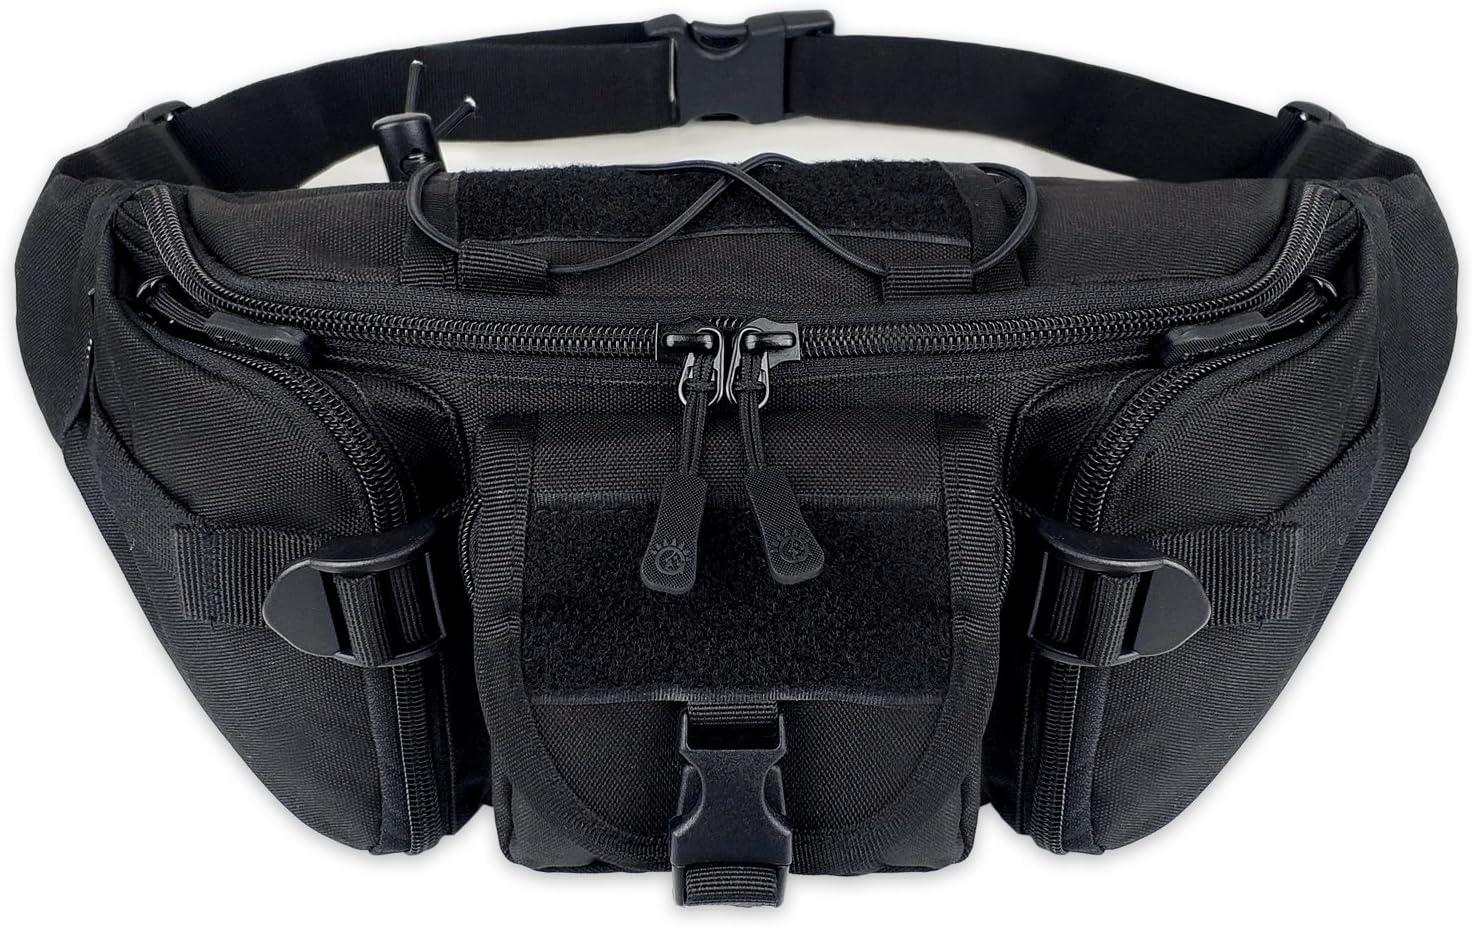 Tactical Bumbag Molle Military Large Waterproof Fanny Pack Bum Bag for Outdoors Hiking Camping Running Walking Trekking Waist Bag